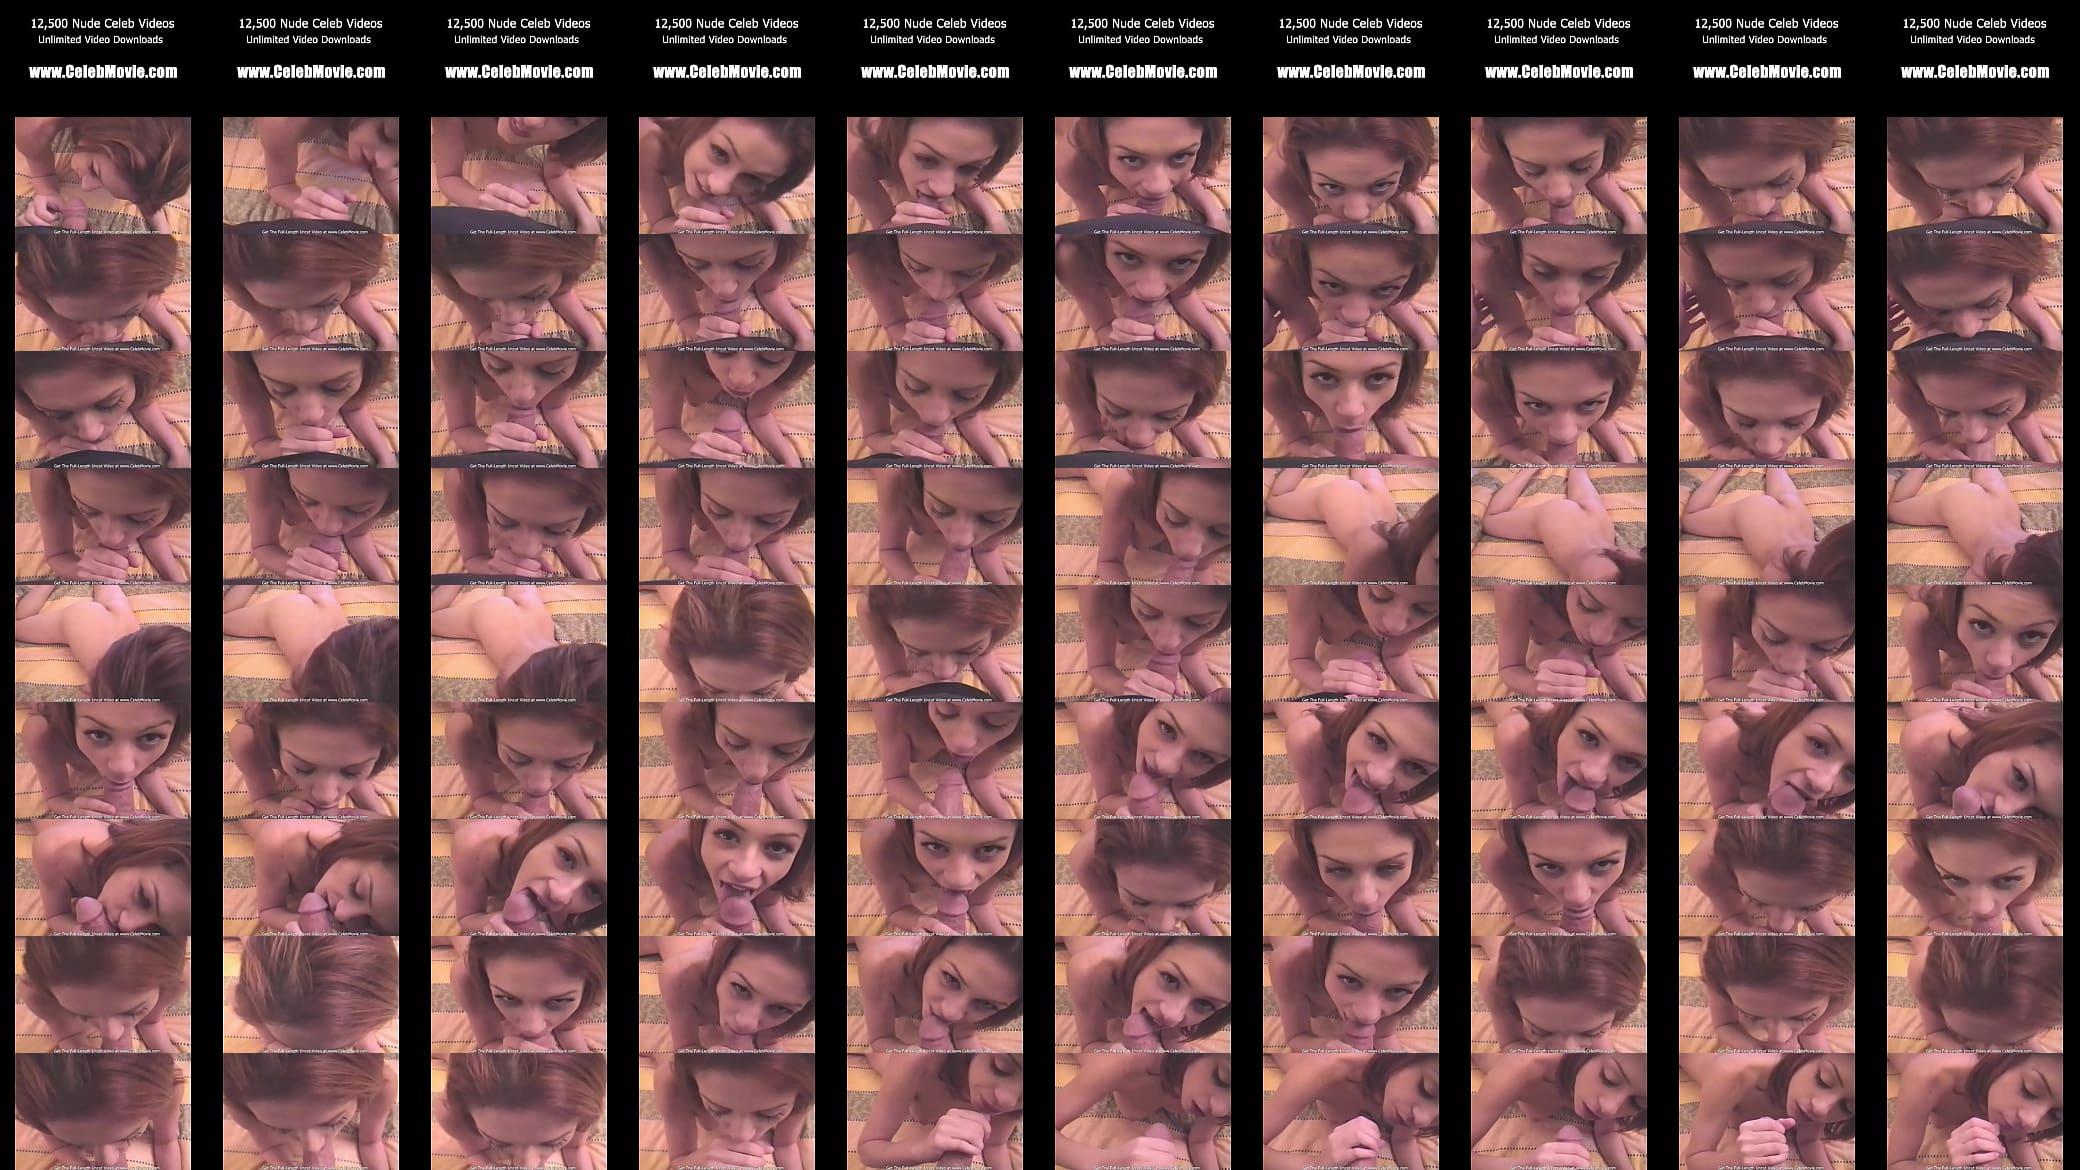 Alyson Hannigan Sex Tape alyson hannigan - sextape - xvideos